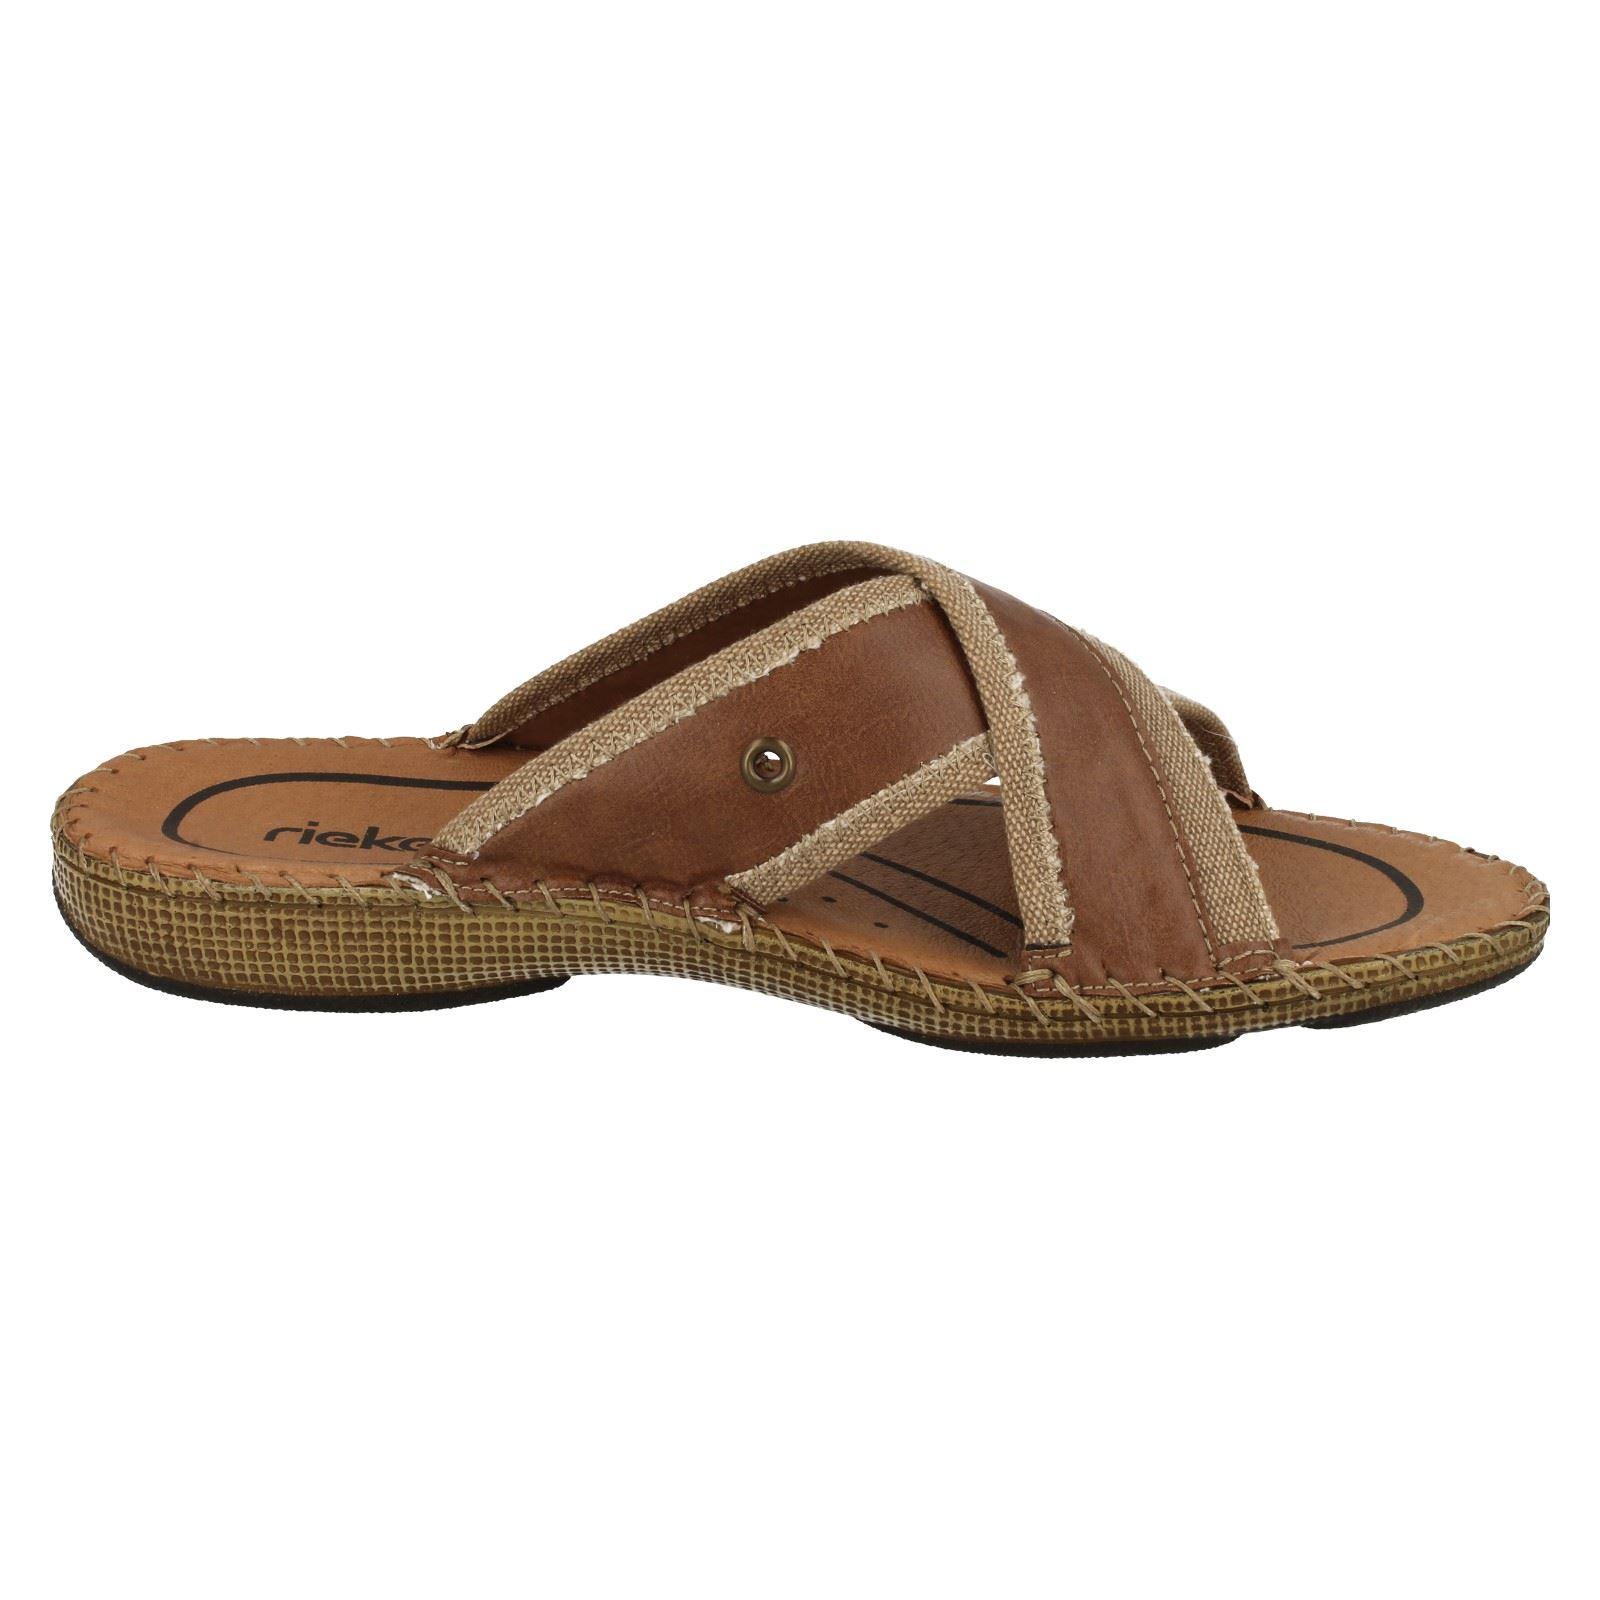 Mens Rieker Slip On Sandals '20554' '20554' Sandals 959046